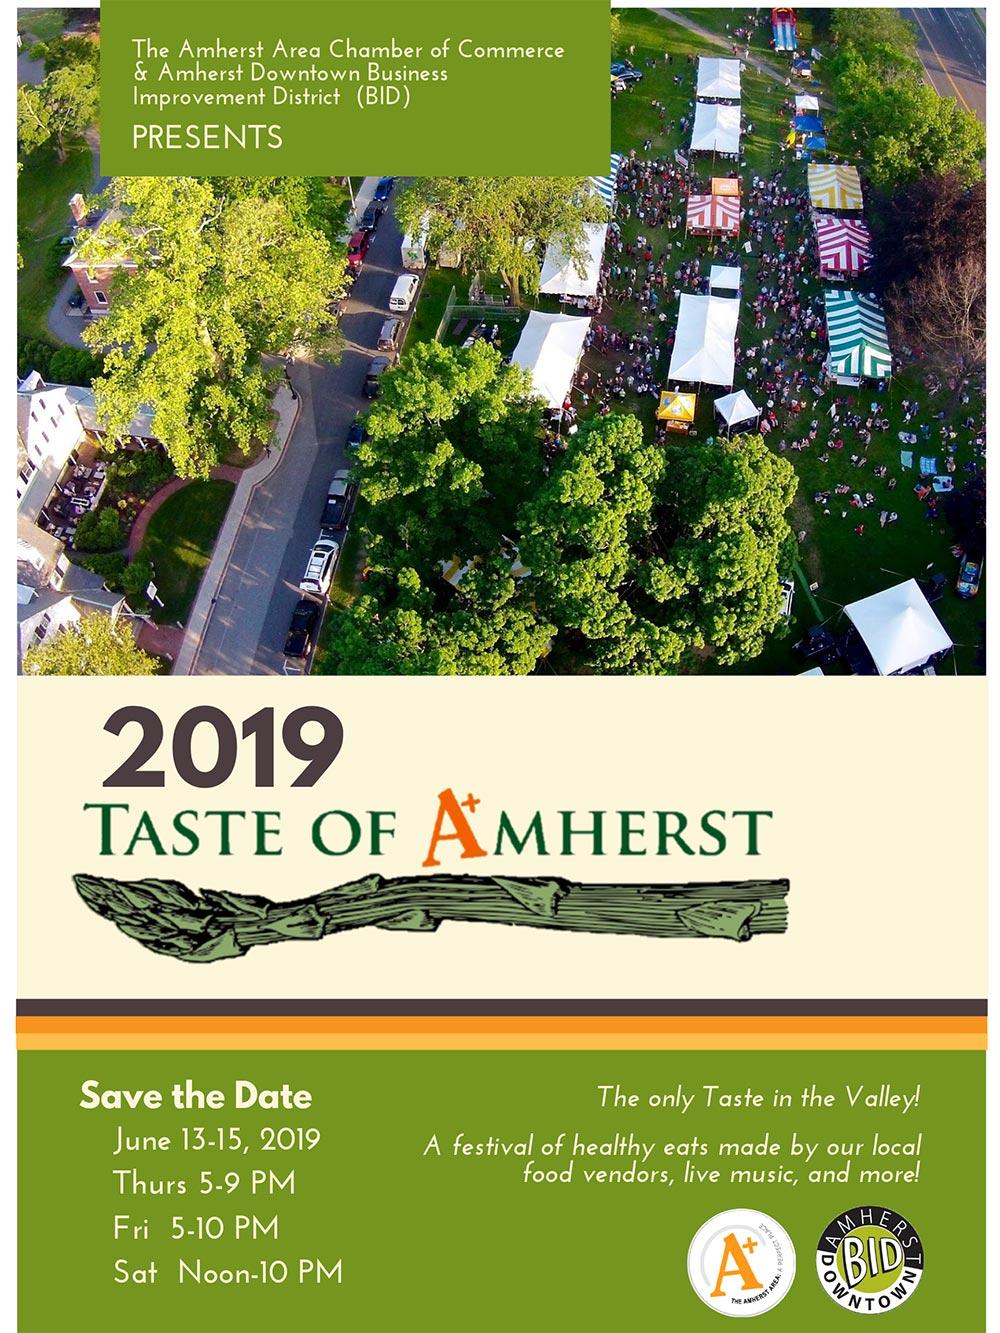 Taste of Amherst Poster